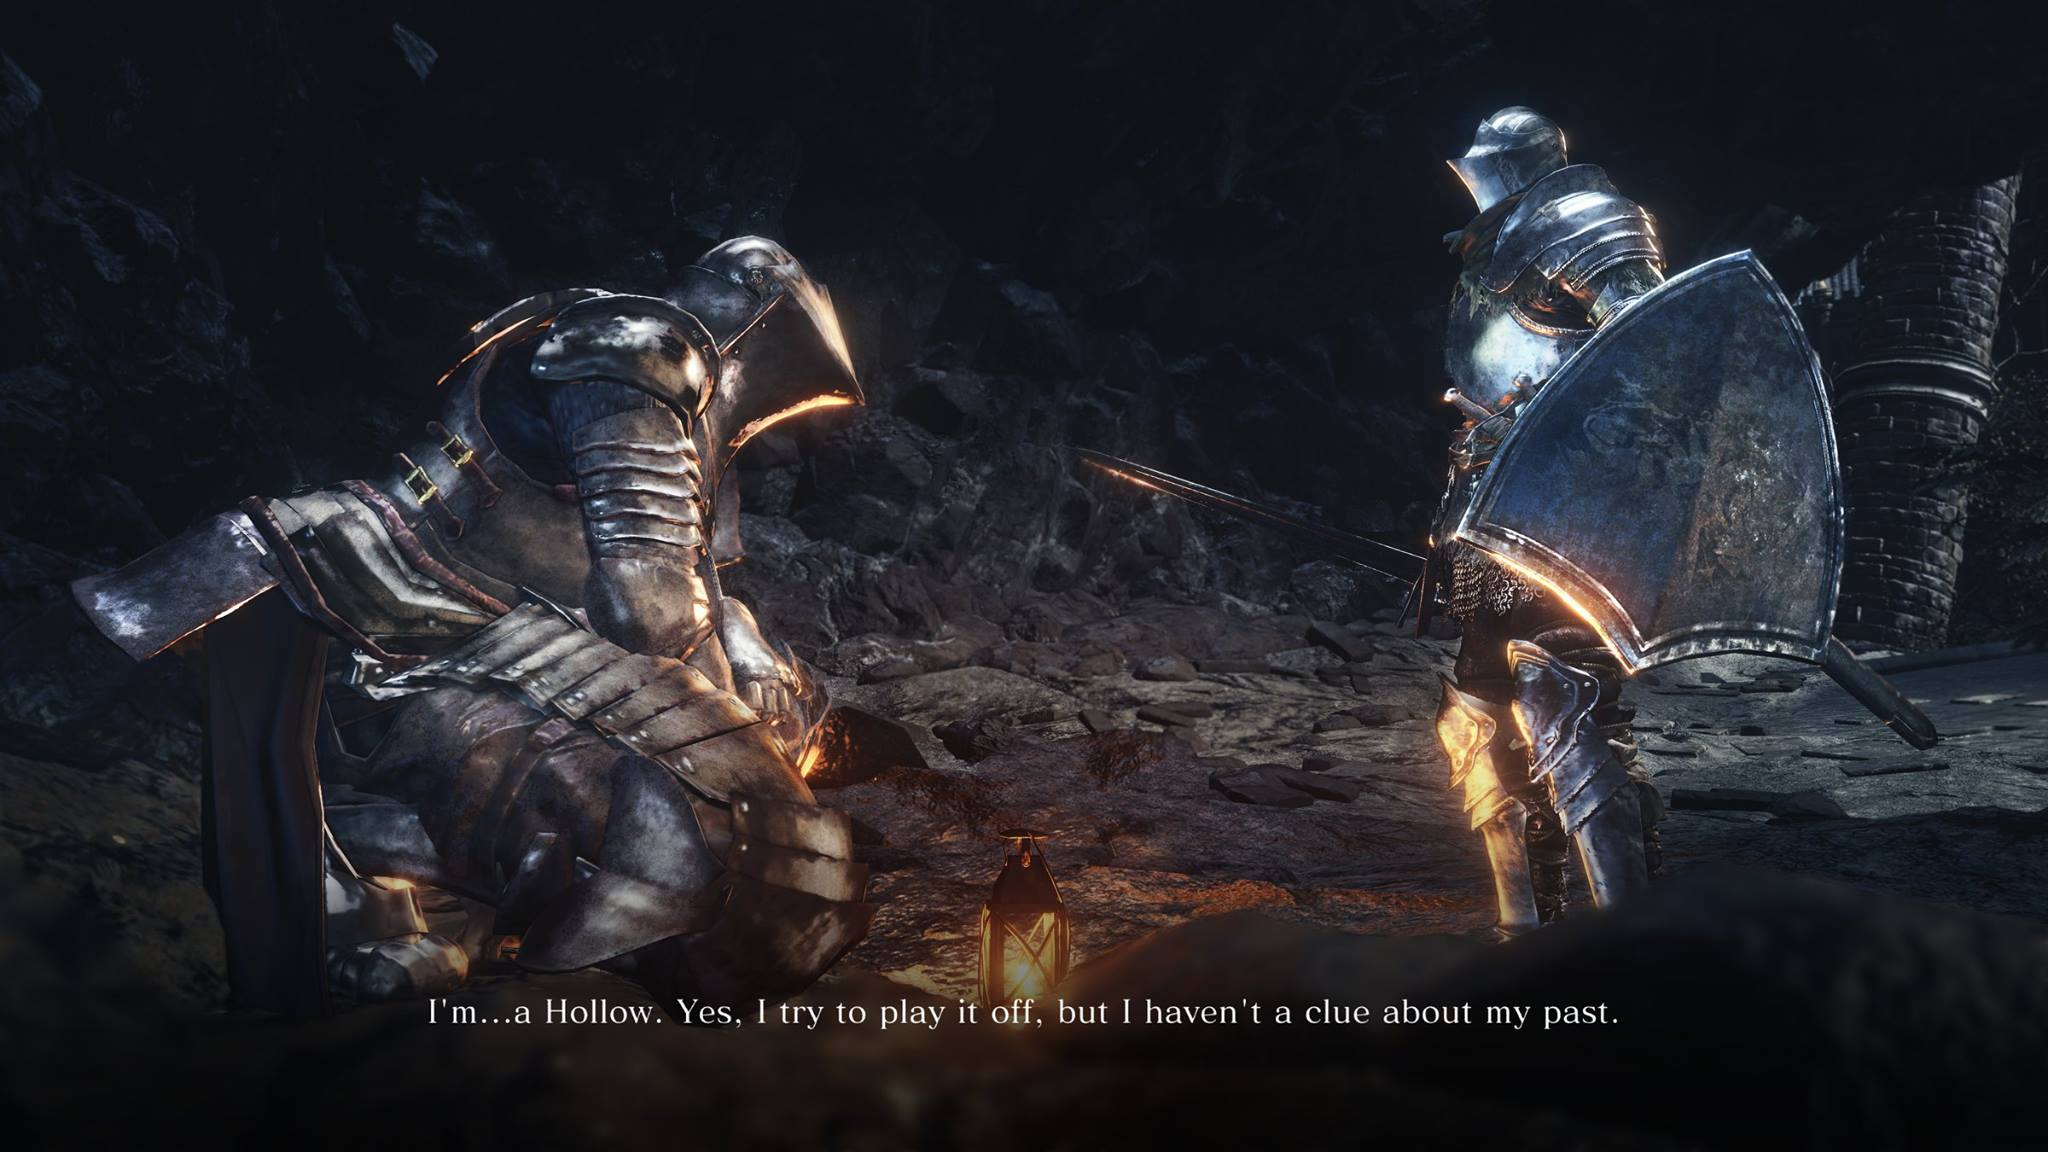 Dark souls 3 patches quest guide | Dark Souls III: Siegward NPC